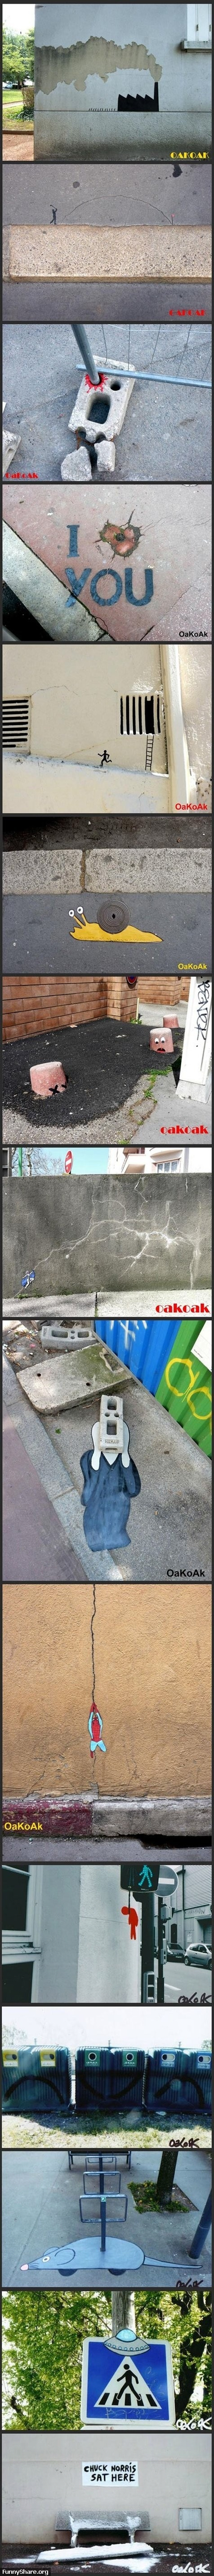 LOL – Brilliant Urban Interventions by OakOak